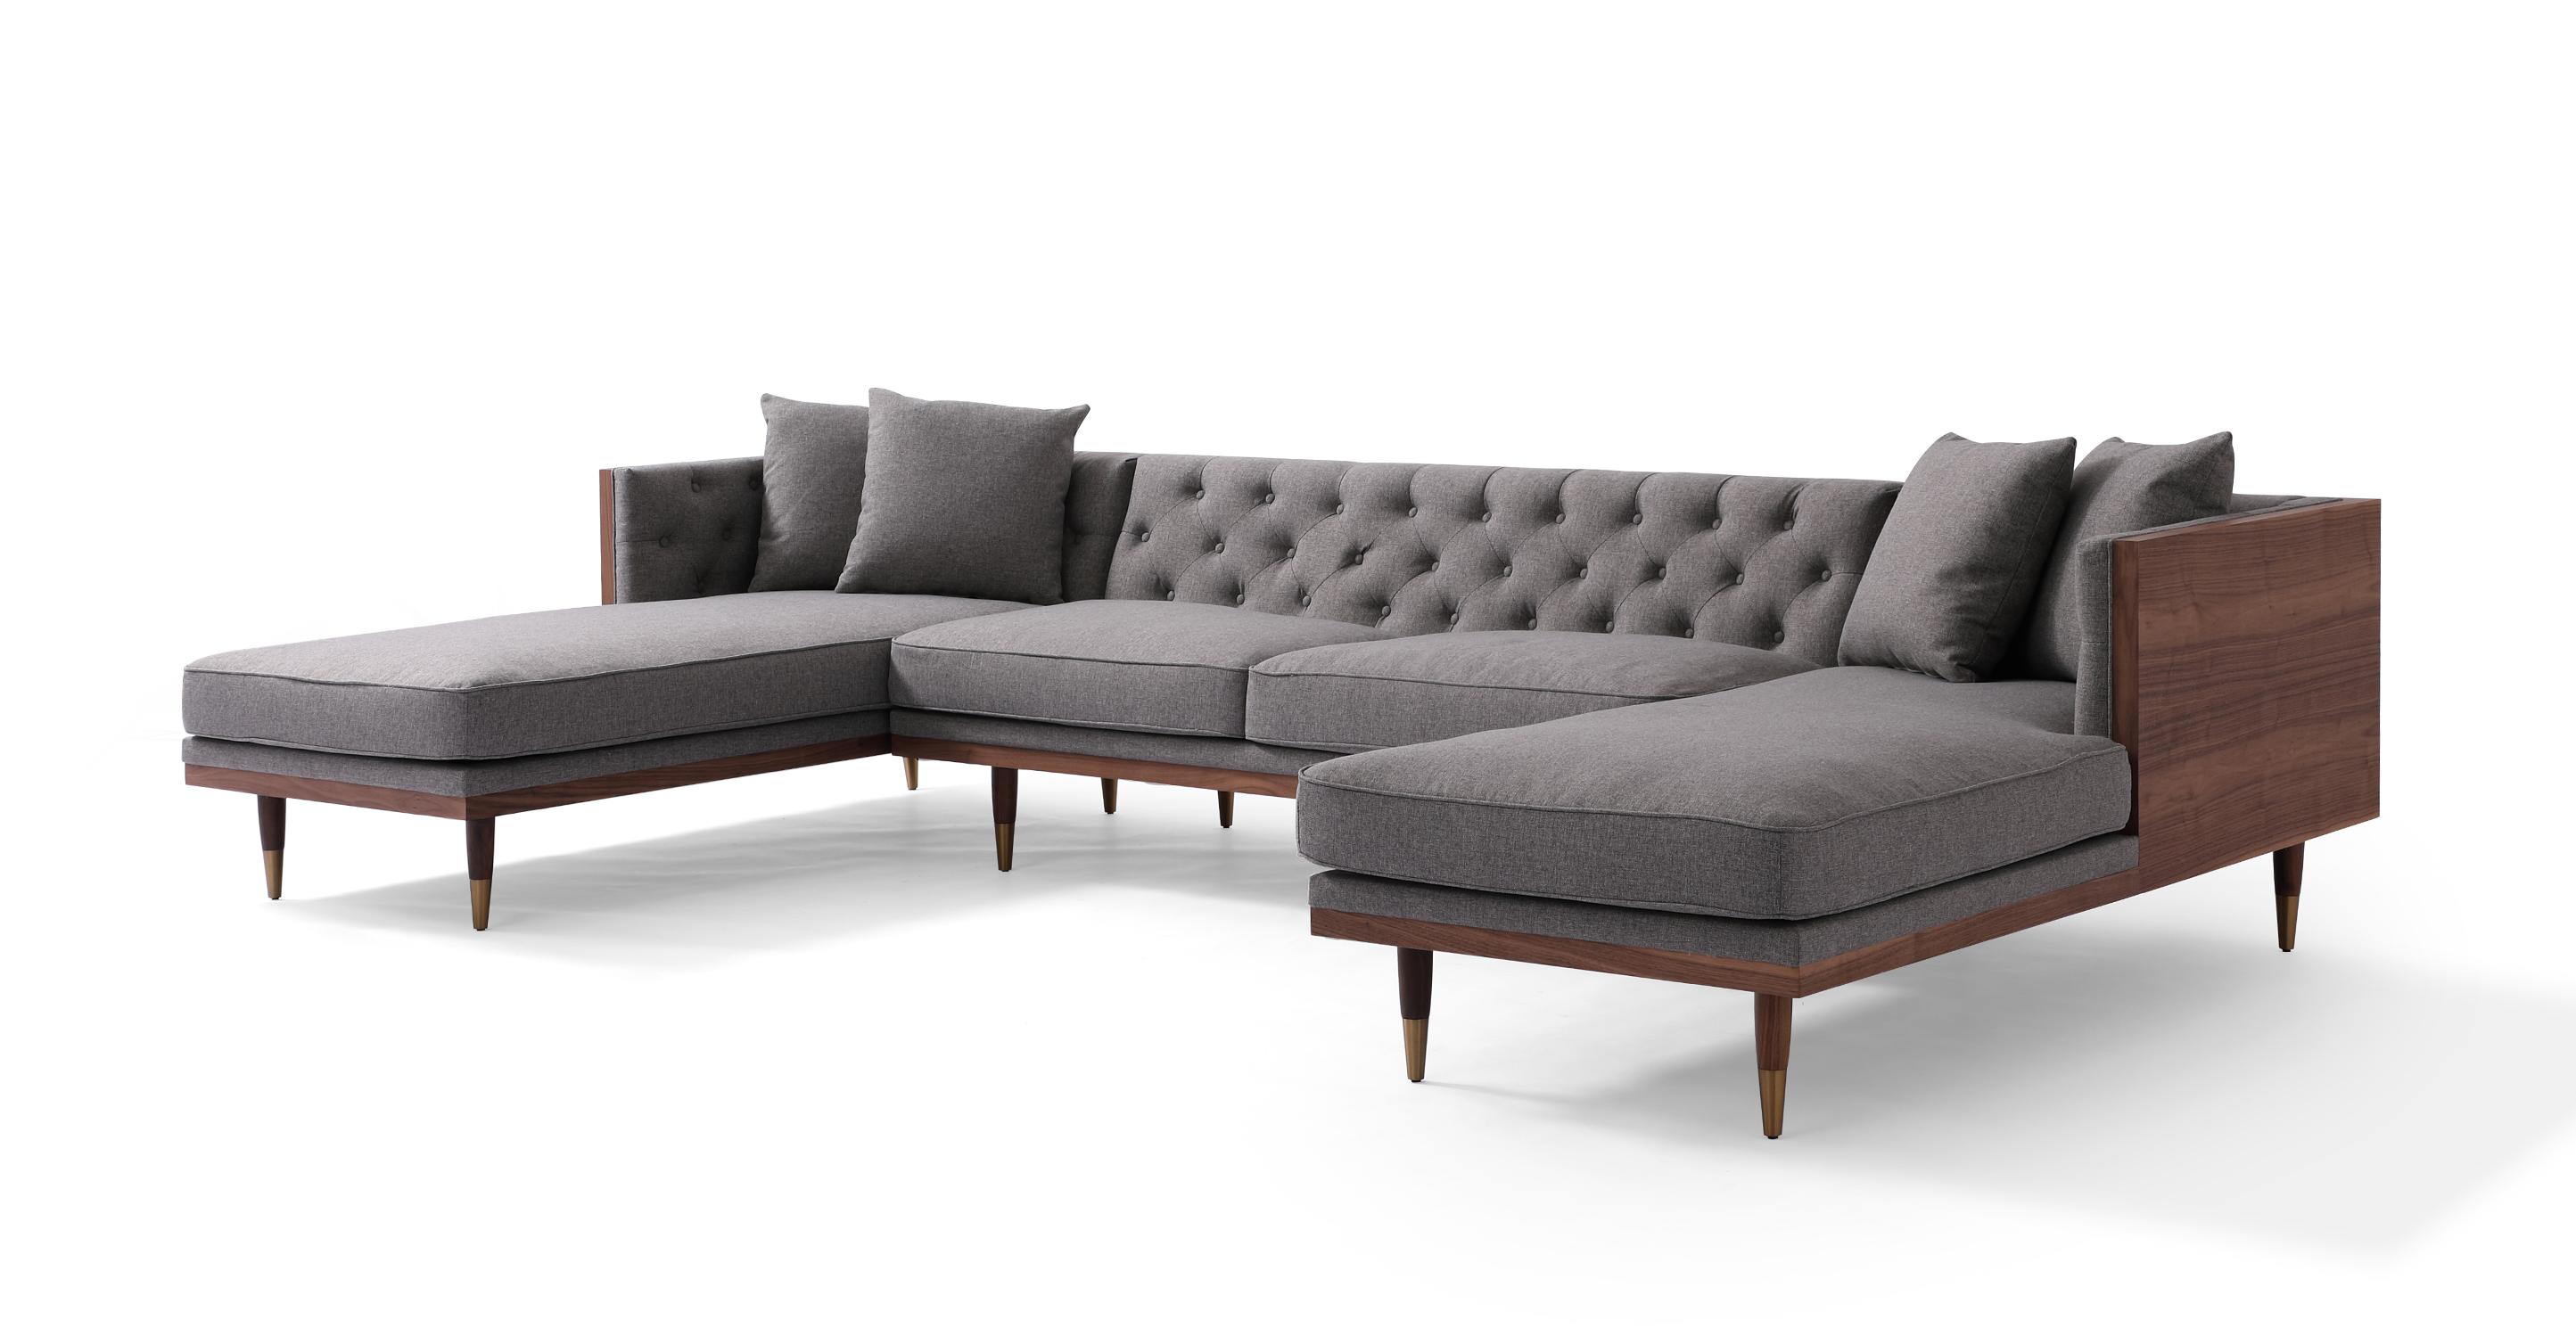 "Woodrow Neo 126"" Fabric Sofa U-Sectional, Walnut/Eames Grey"